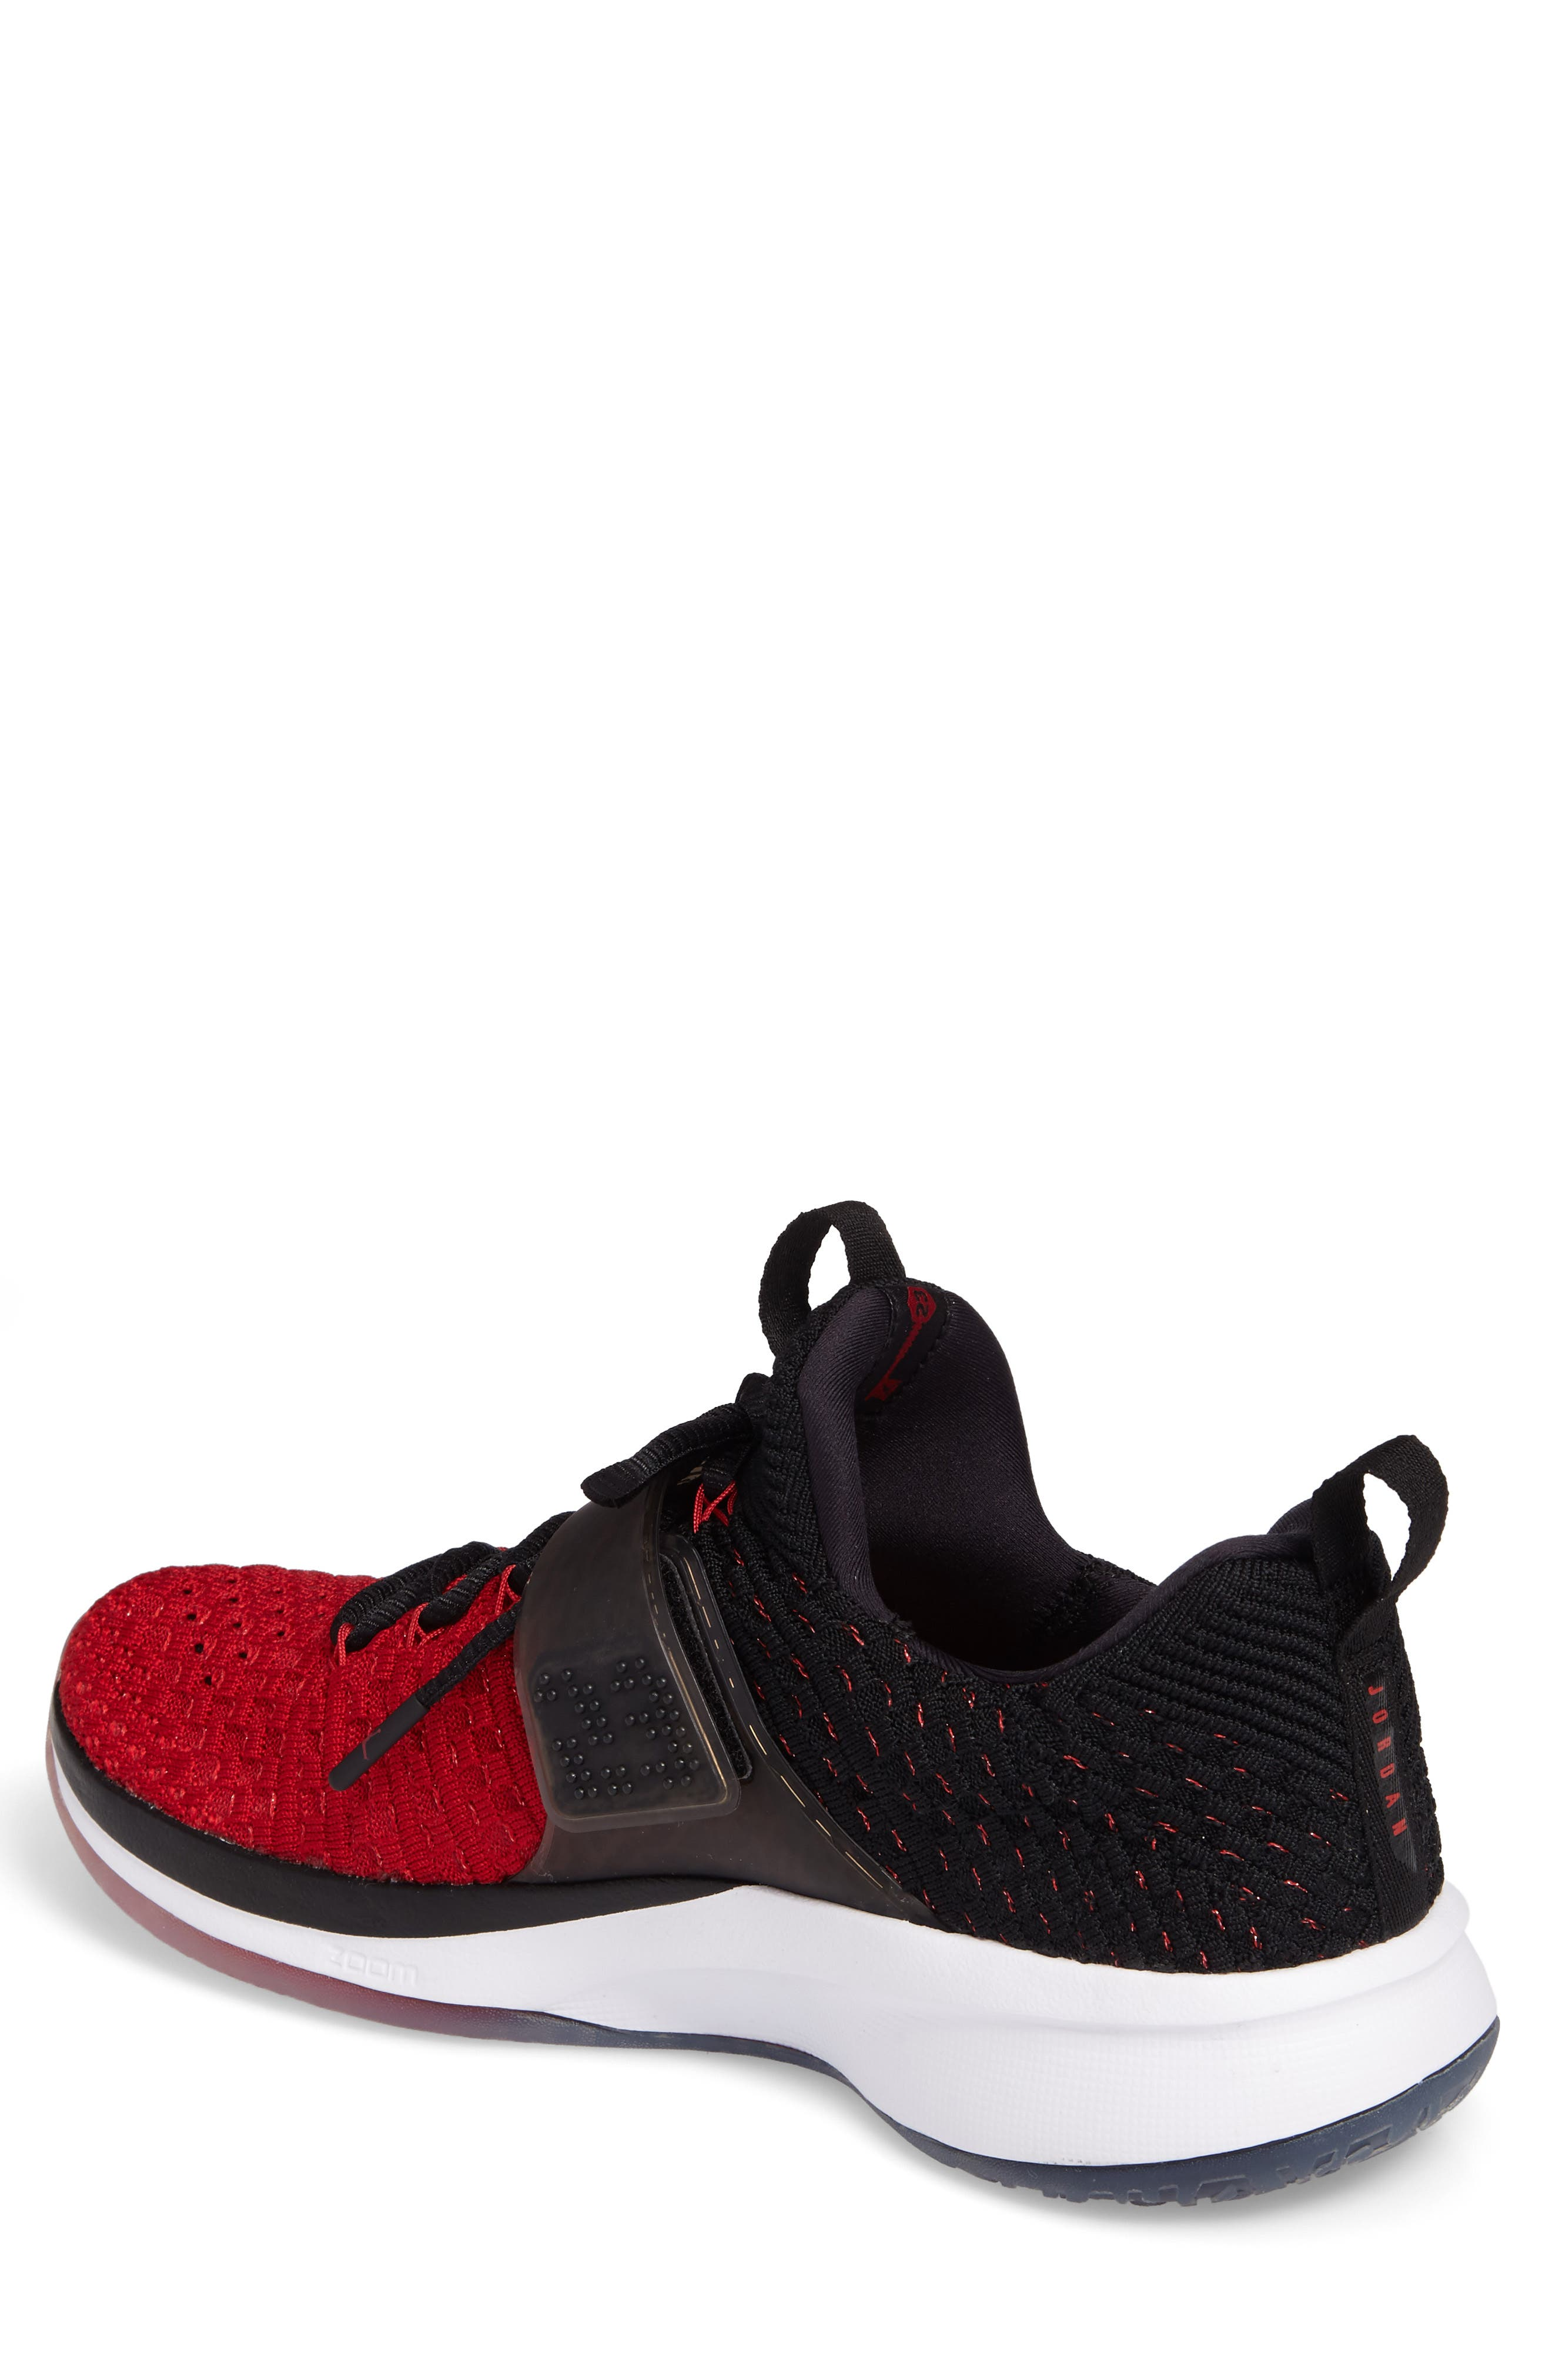 Jordan Flyknit Trainer 2 Low Sneaker,                             Alternate thumbnail 10, color,